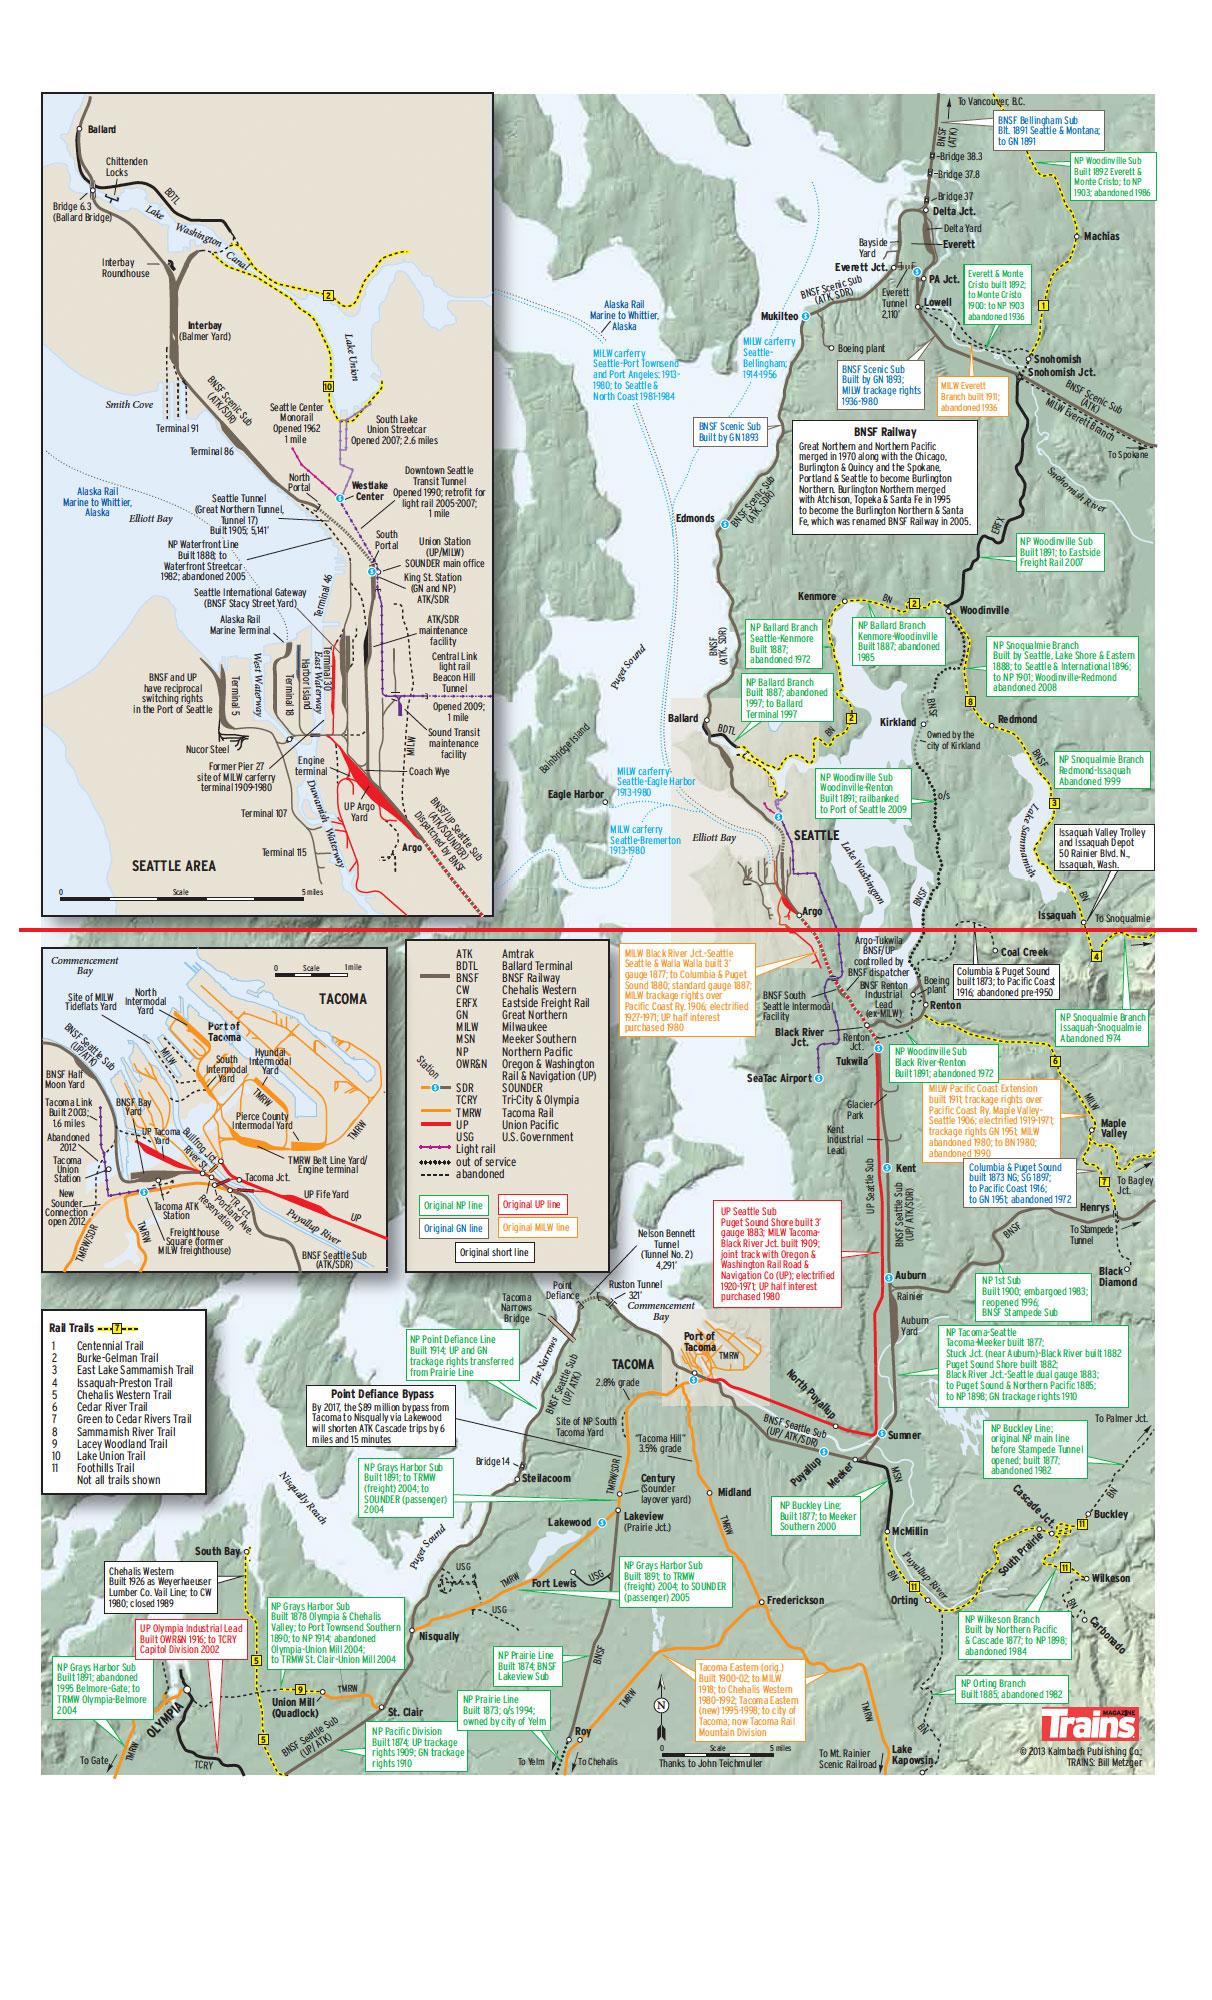 See Whats Inside Railroad Maps Trains Magazine Trains News - Bnsf railway us map